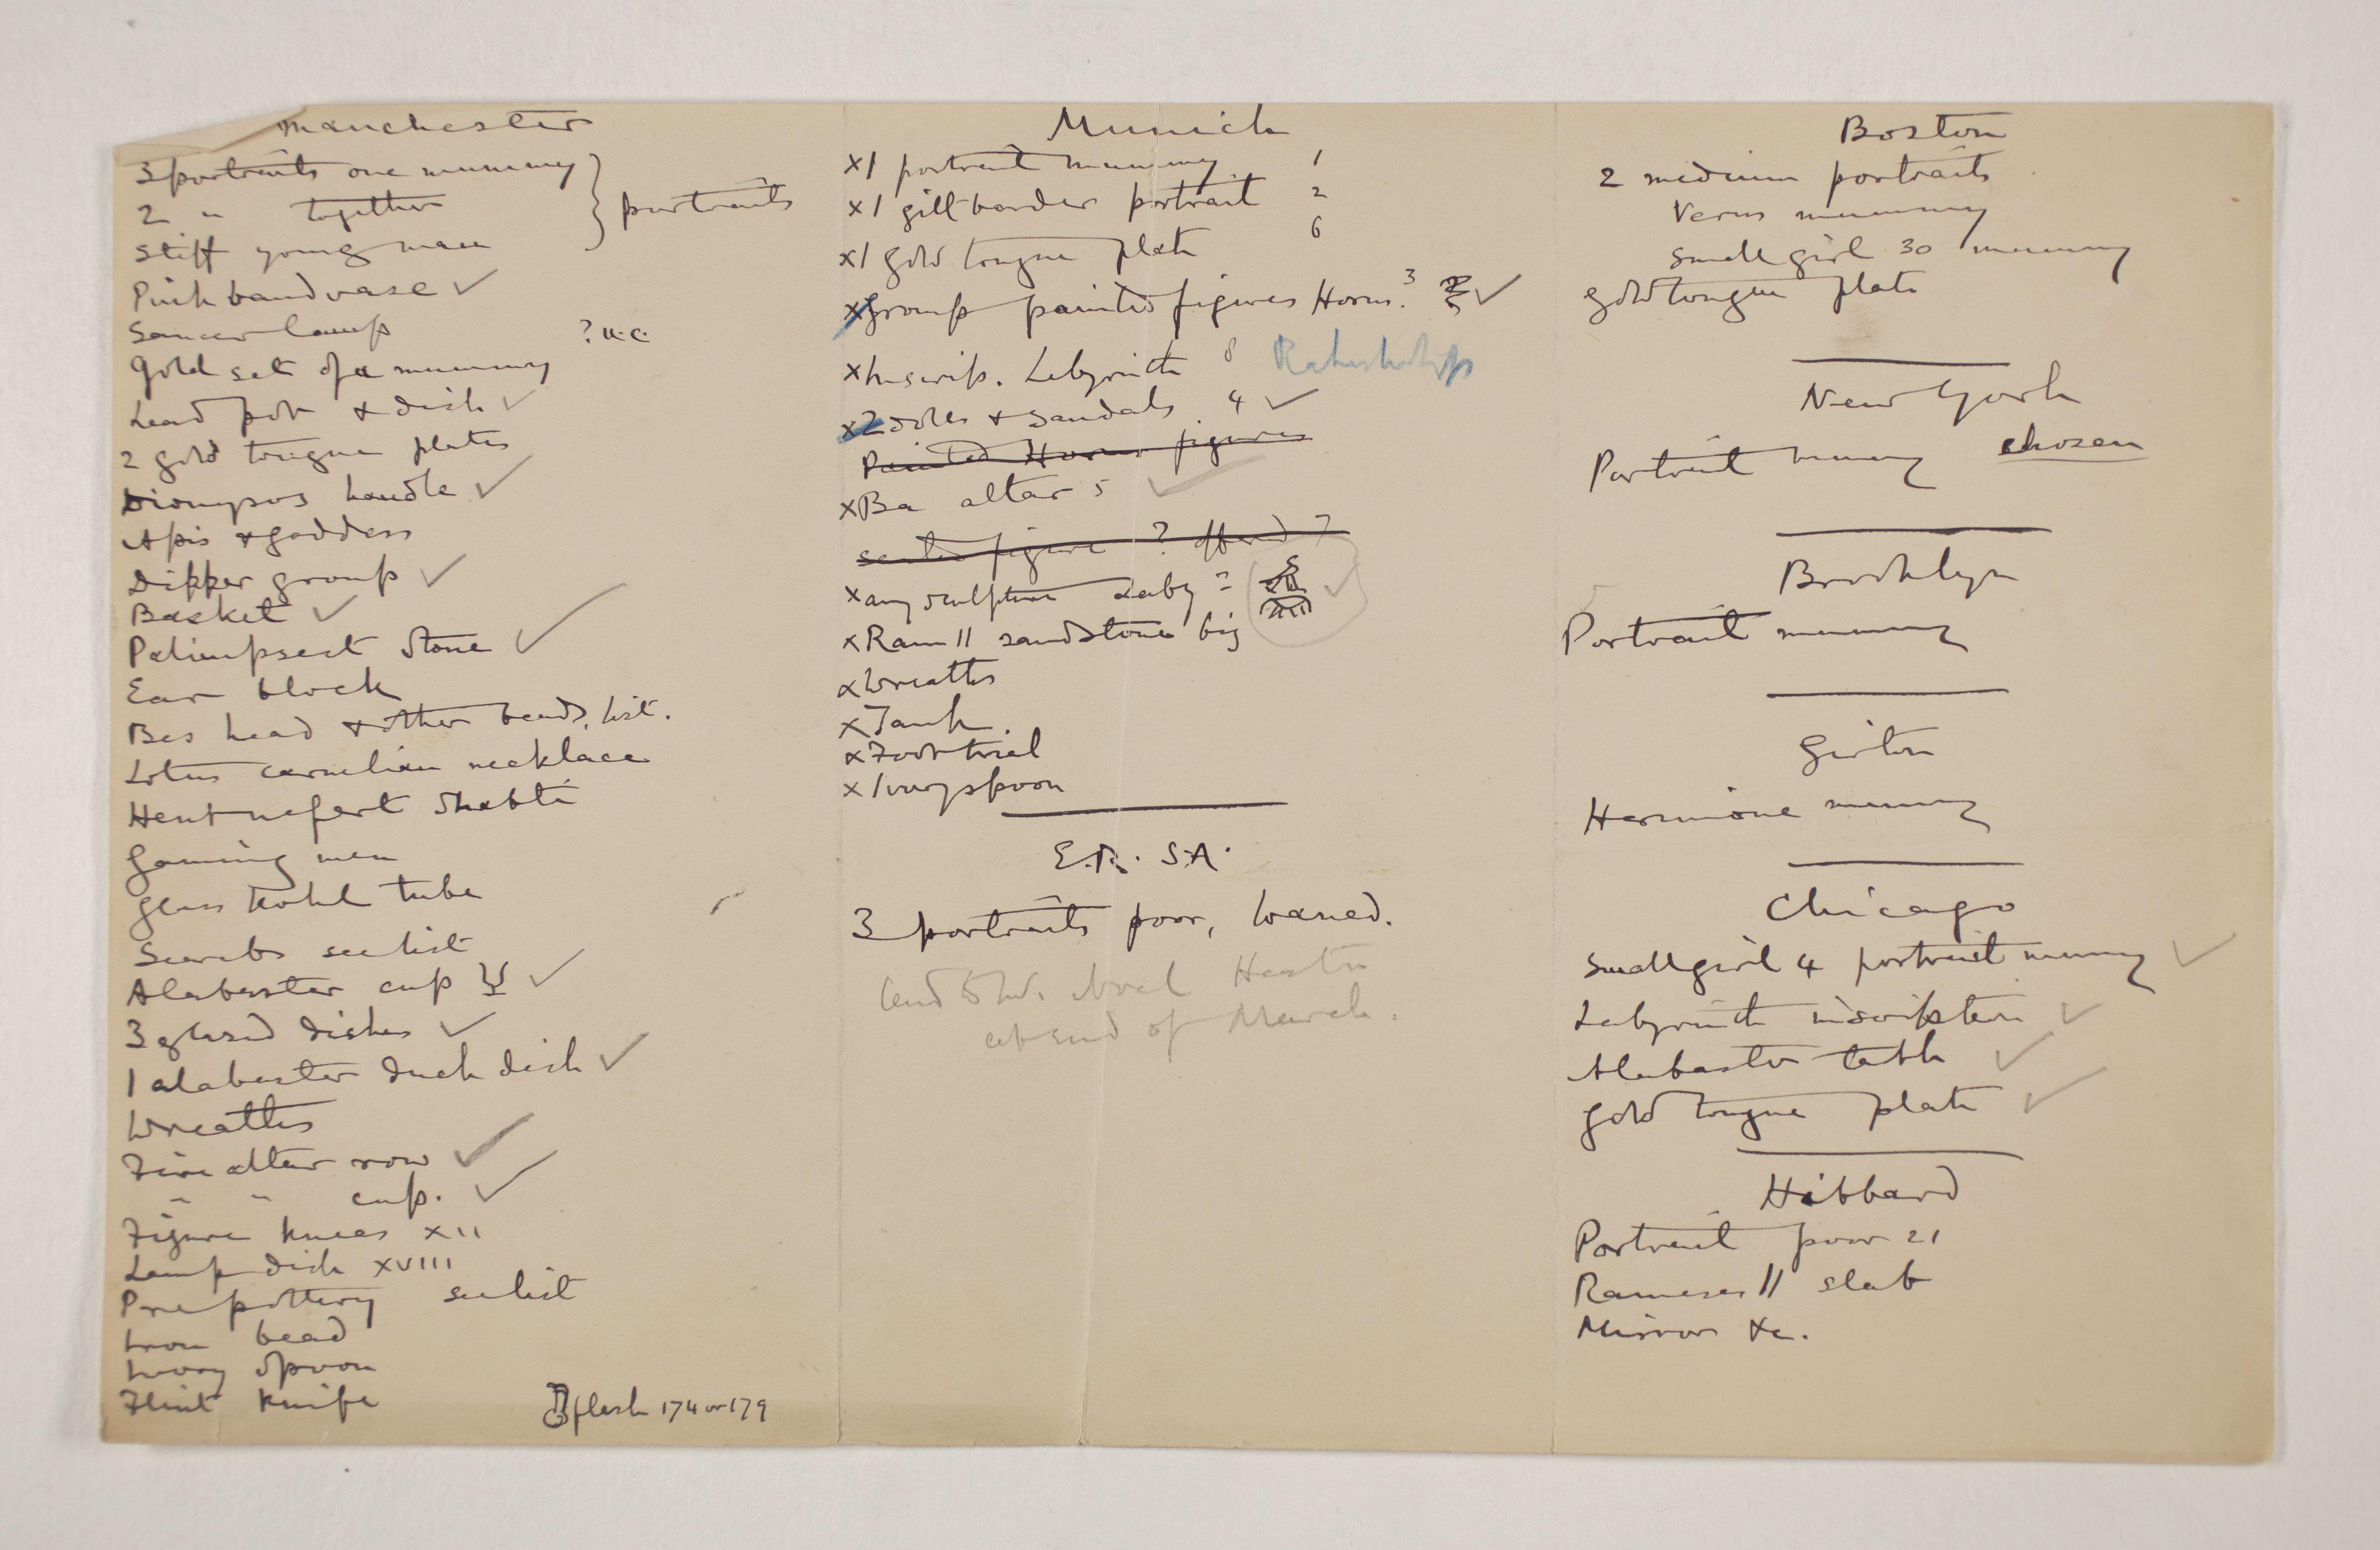 1910-11 Hawara, Gerzeh, Memphis, Mazghuneh Multiple institution list PMA/WFP1/D/19/9